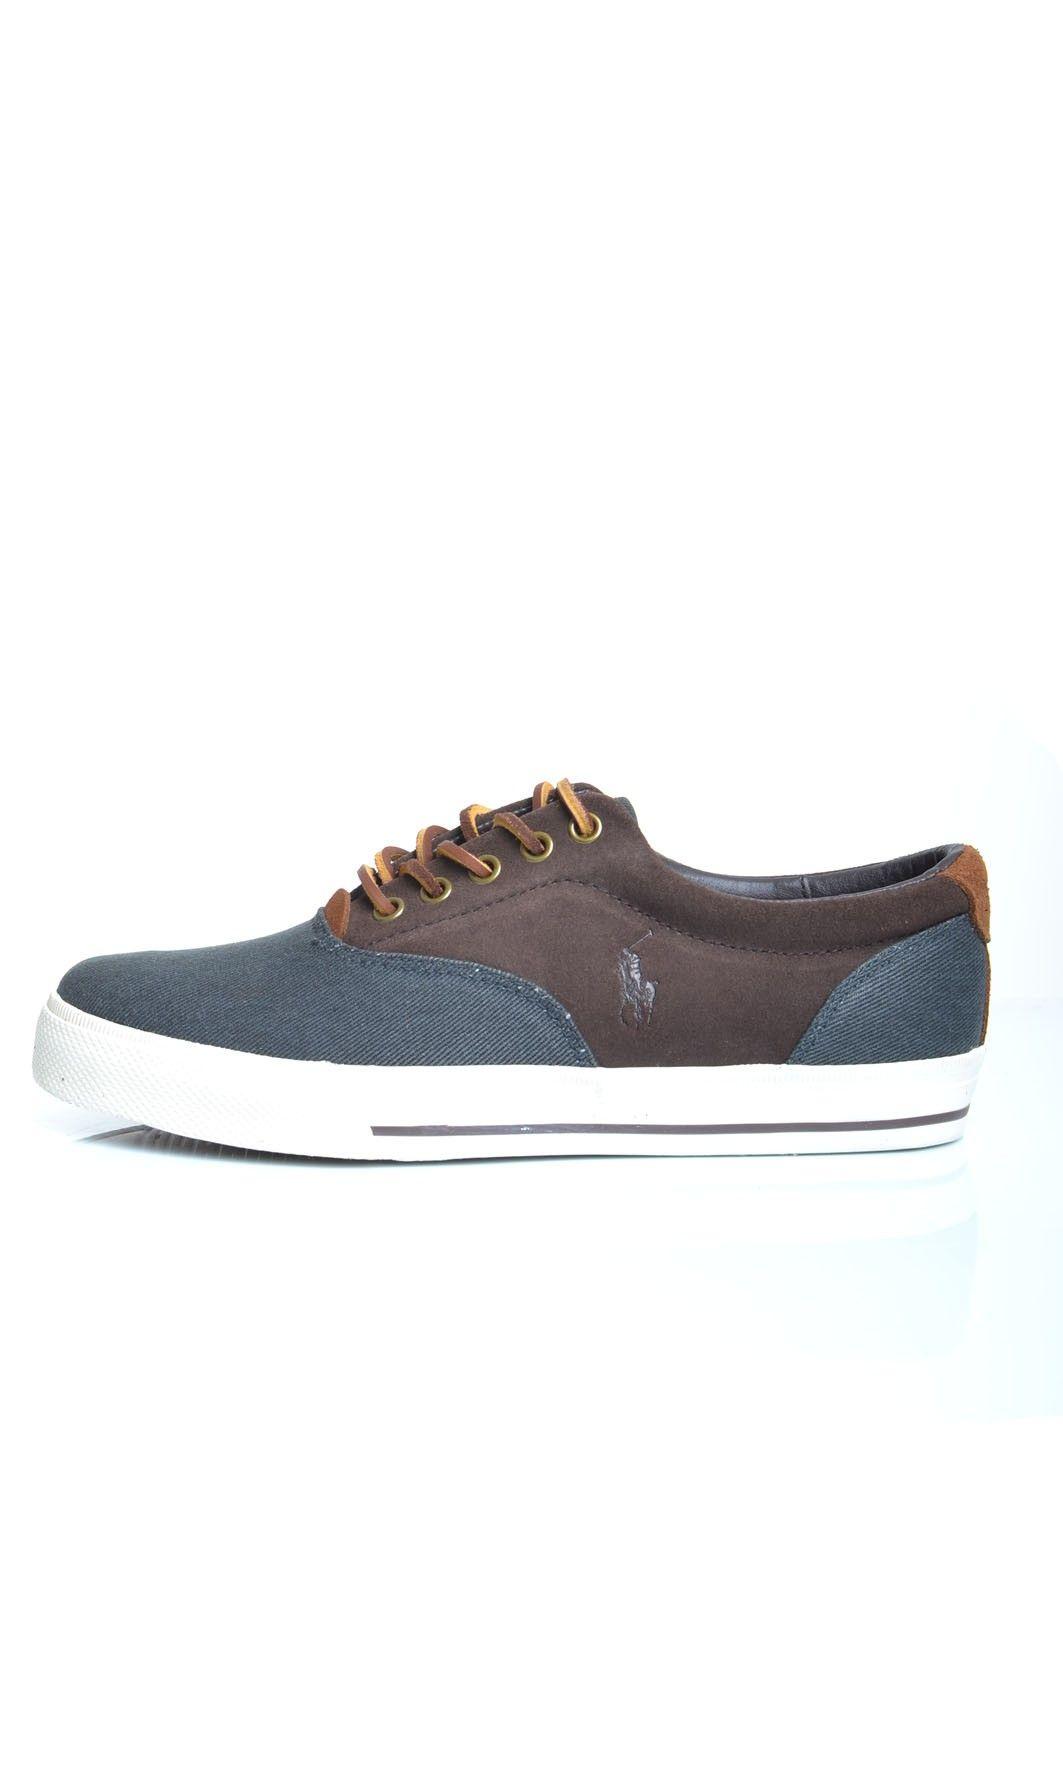 Scarpe Polo Ralph Lauren VAUGHN SA NE Sneakers Basse Camoscio E Tessuto -  Marrone - Scarpe 43b1b859494